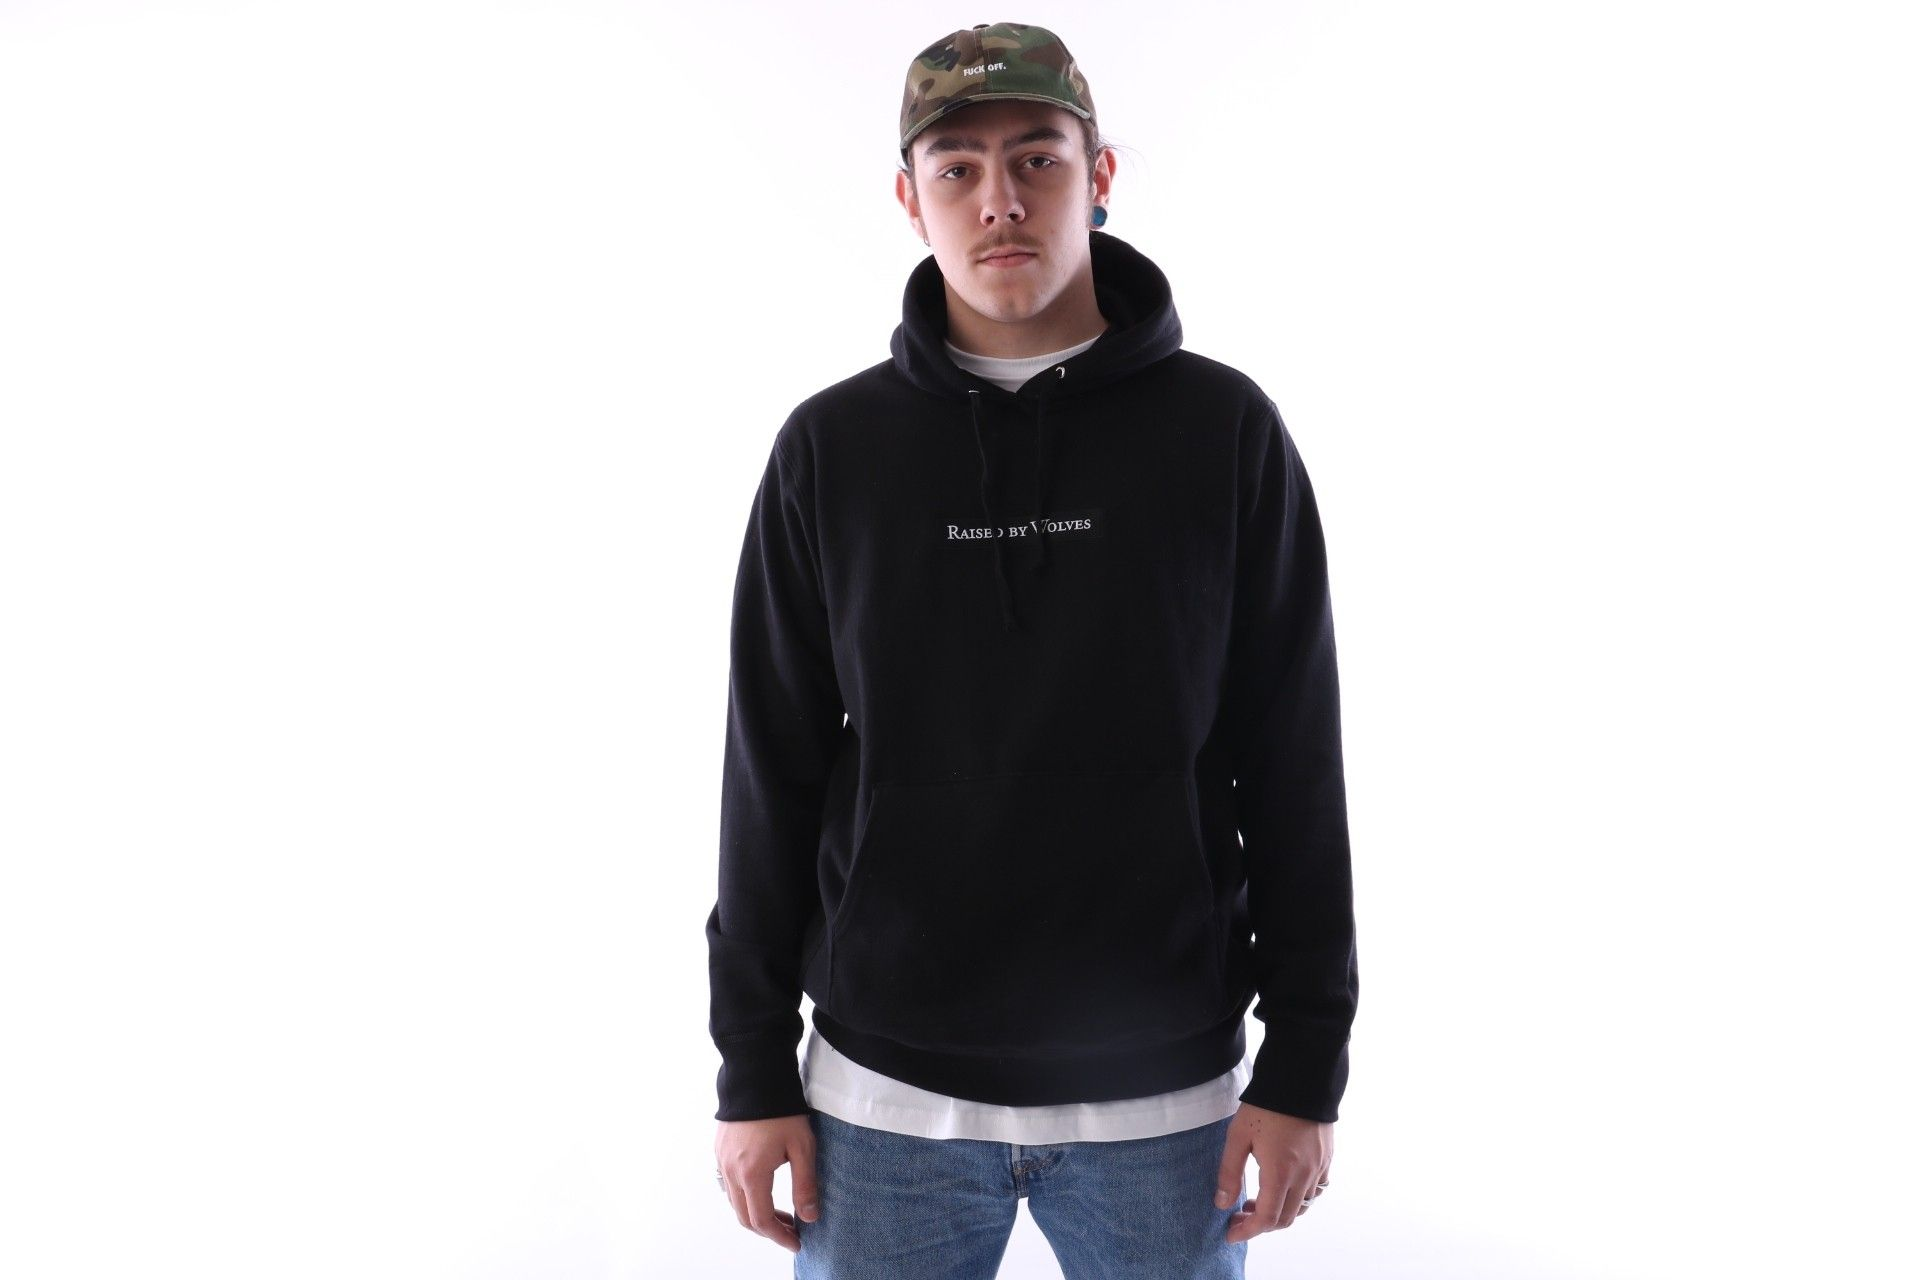 Afbeelding van Raised By Wolves Box Logo Hooded Sweatshirt Black French Terry